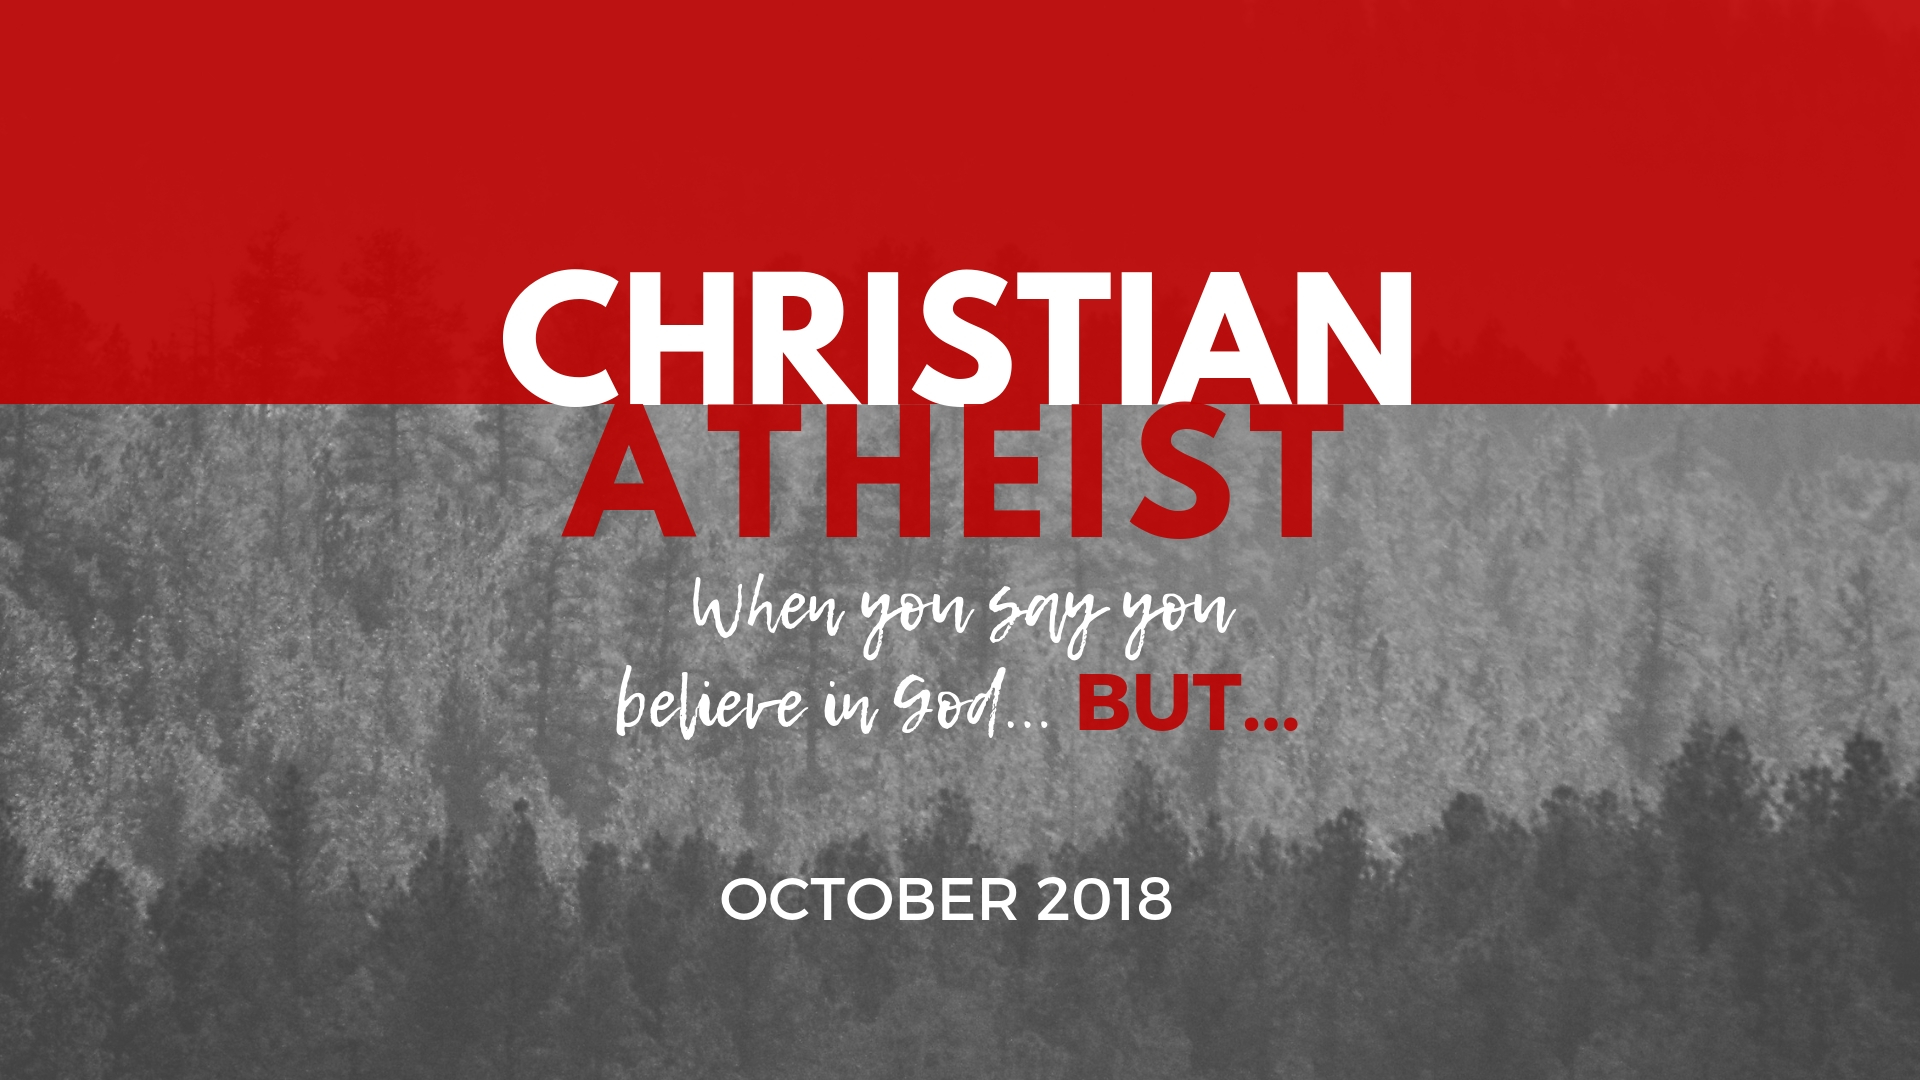 Christian Atheist - October 2018